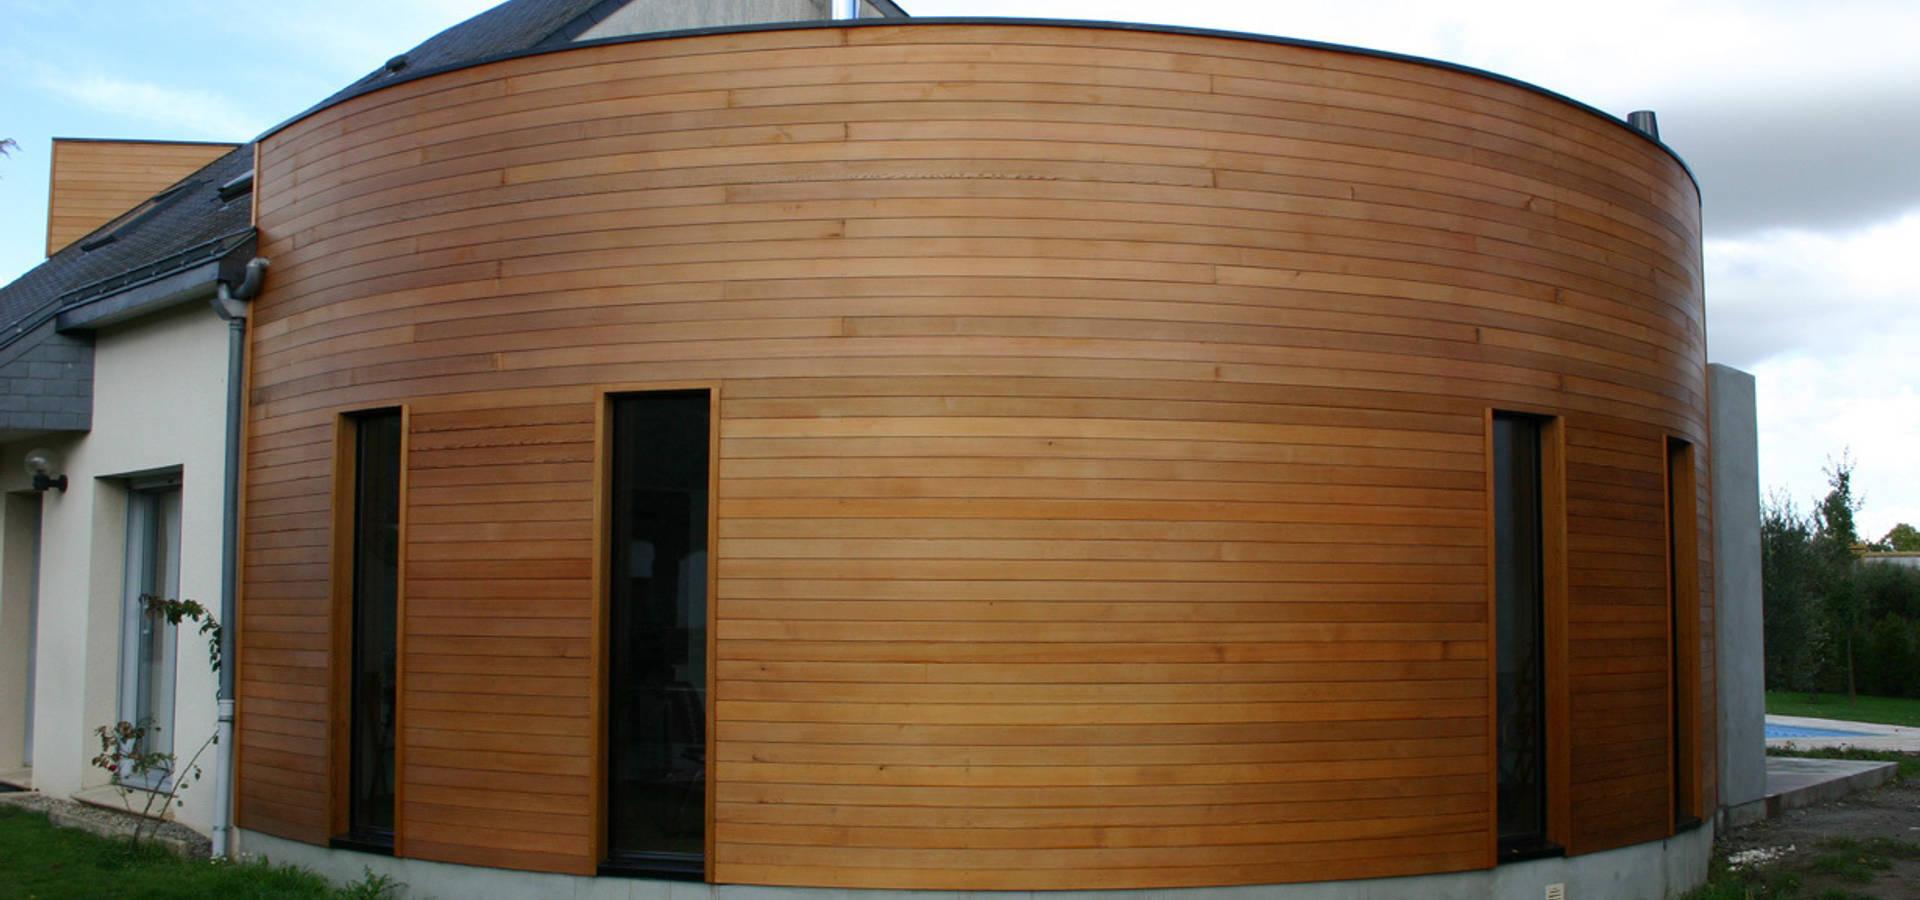 extension g par a2 architecture homify. Black Bedroom Furniture Sets. Home Design Ideas